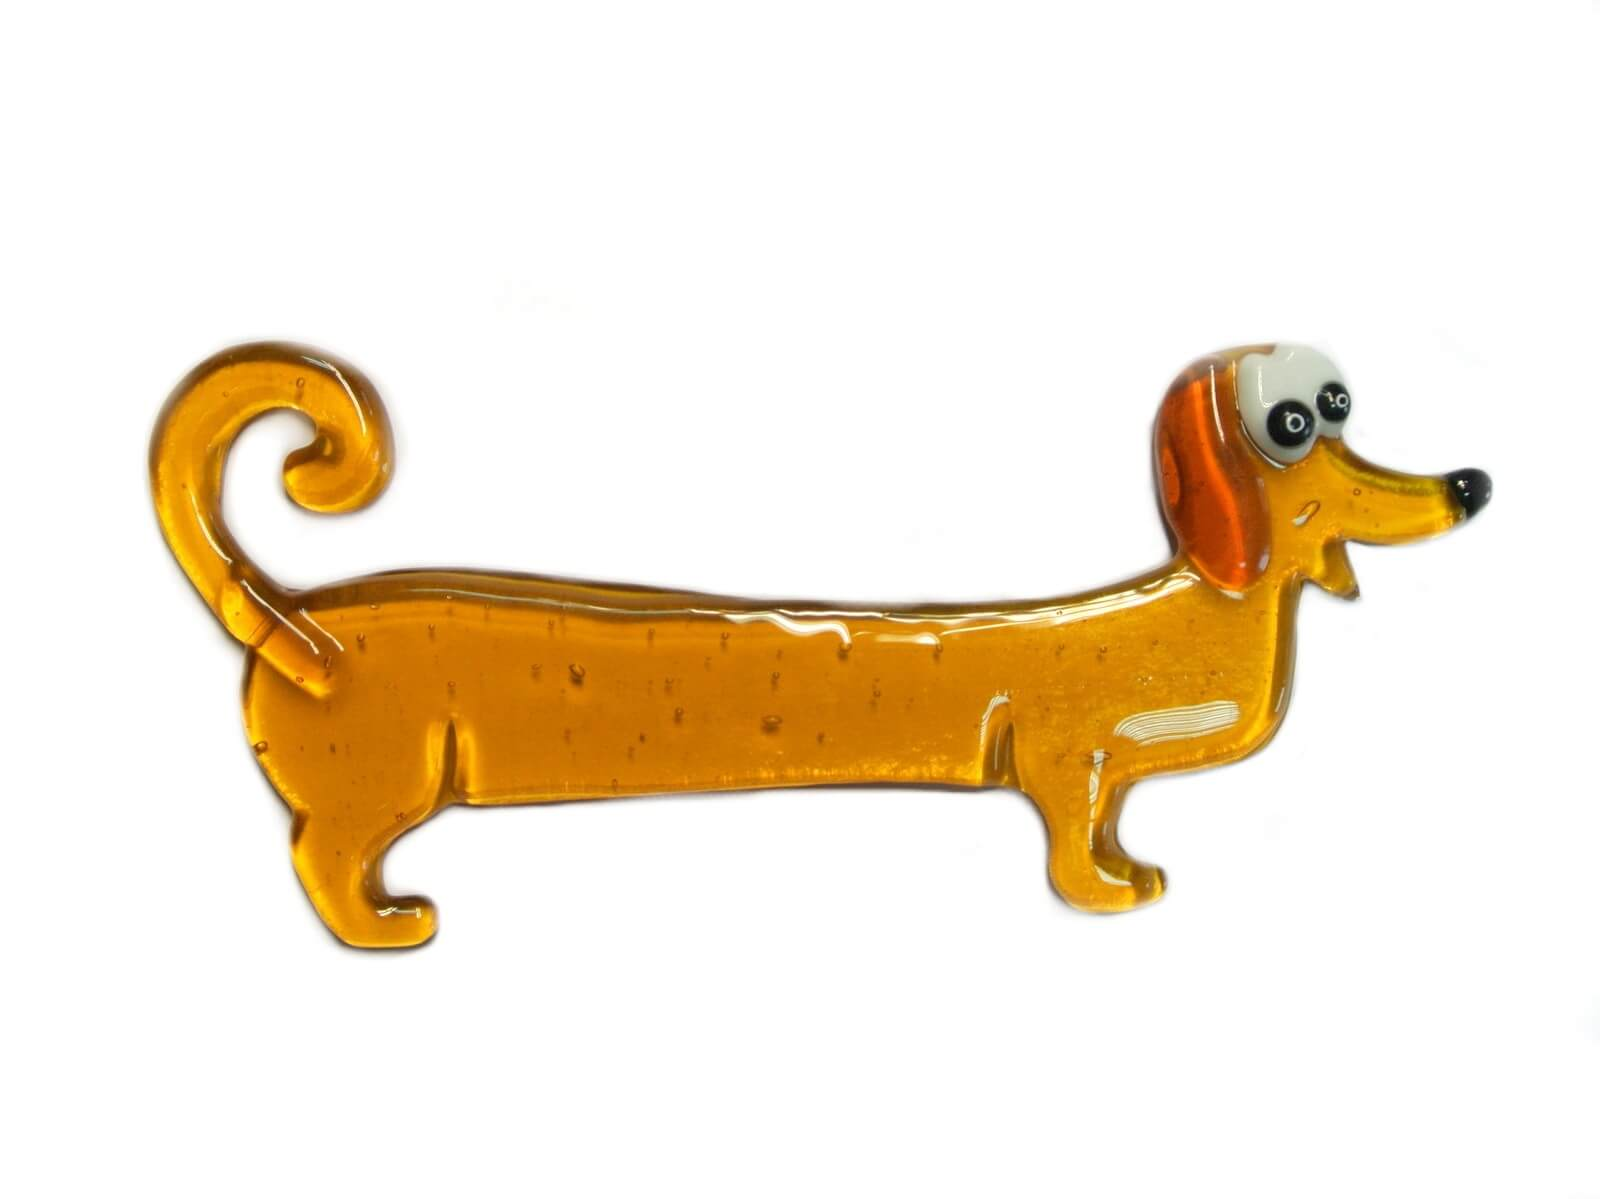 Figurica životinje ručnoizrađena od stakla - pas